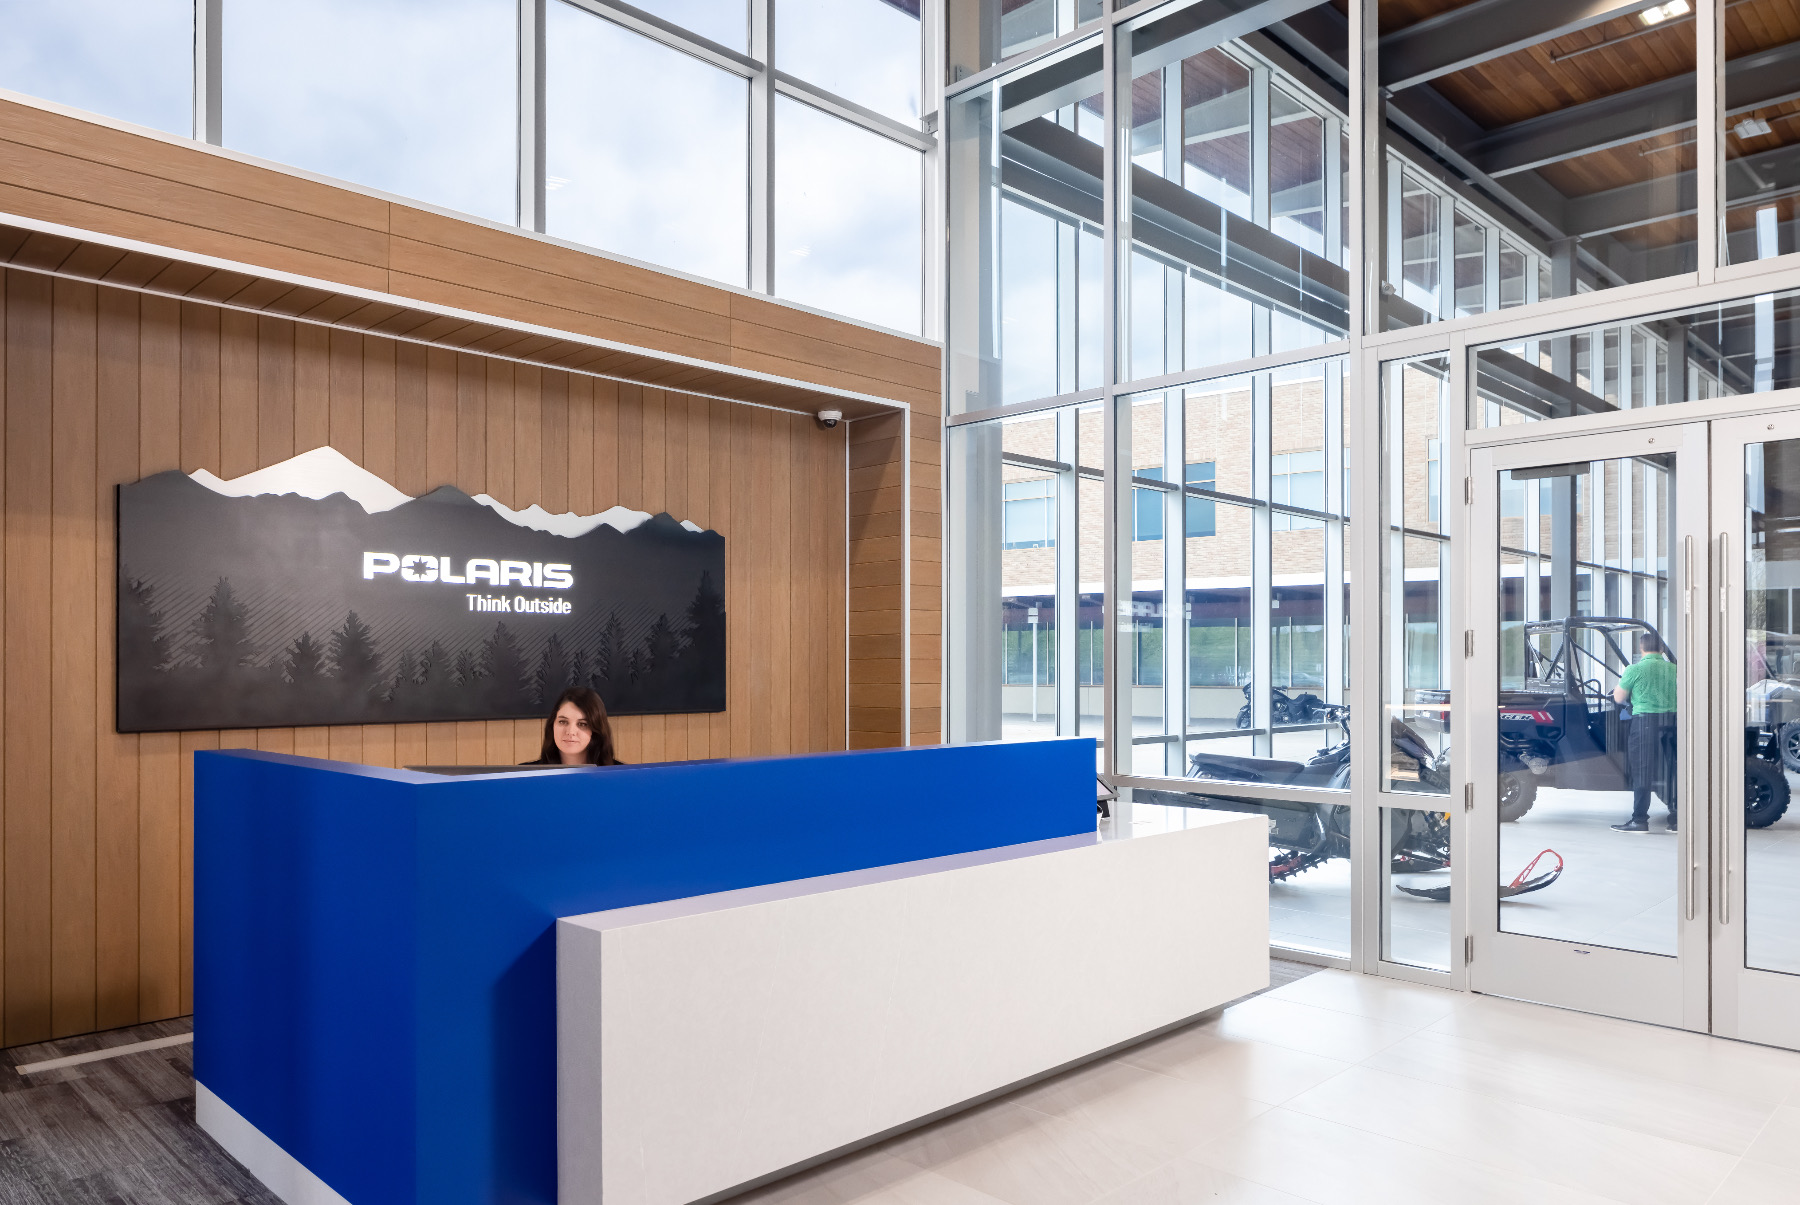 polaris-medina-office-2-2